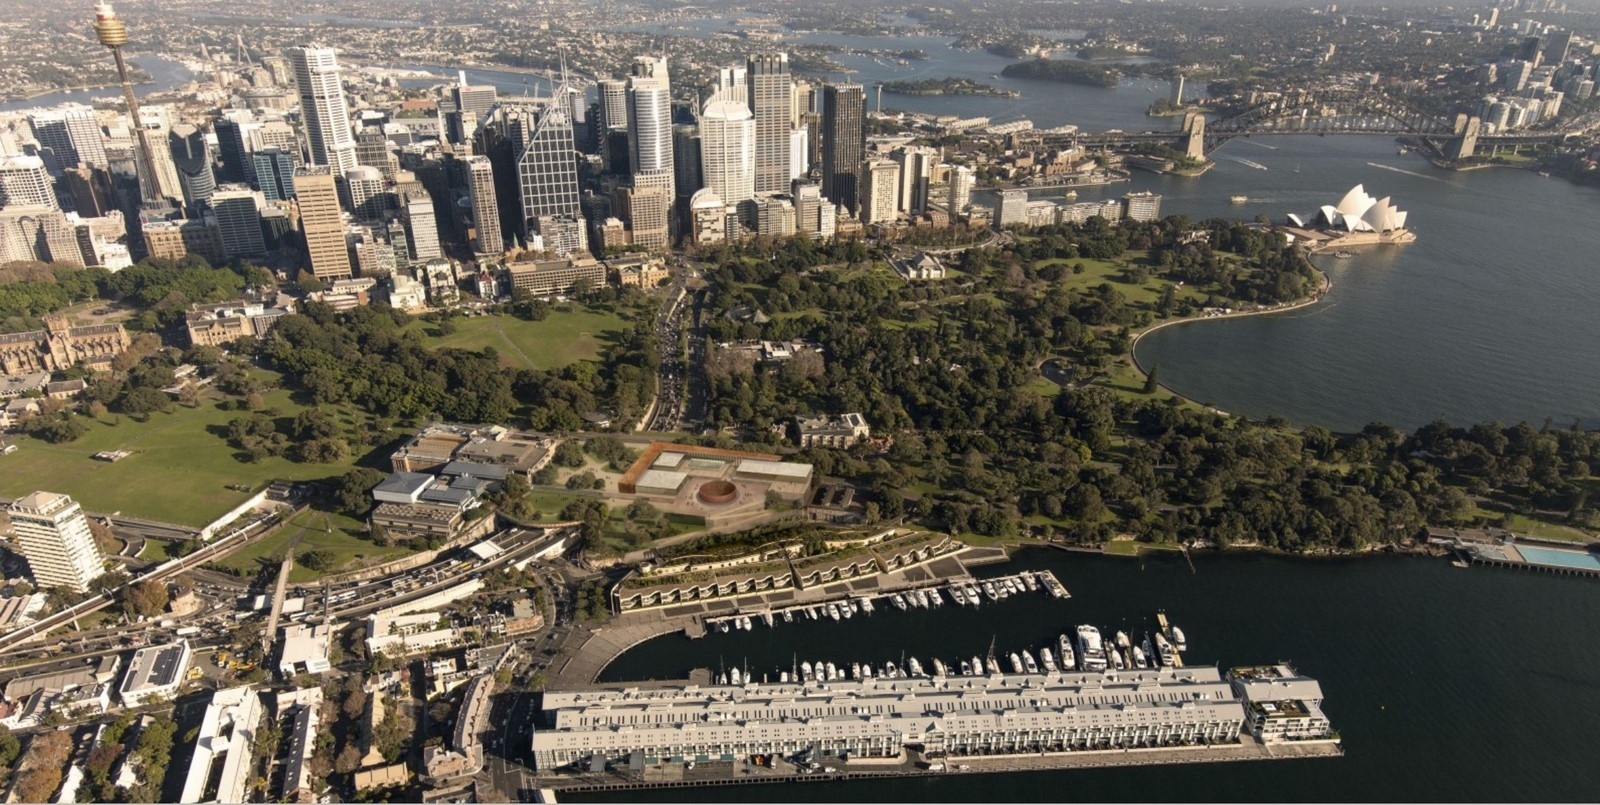 Sydney Modern Project by Rahul Mehrotra: Fabric for Art - Sheet2